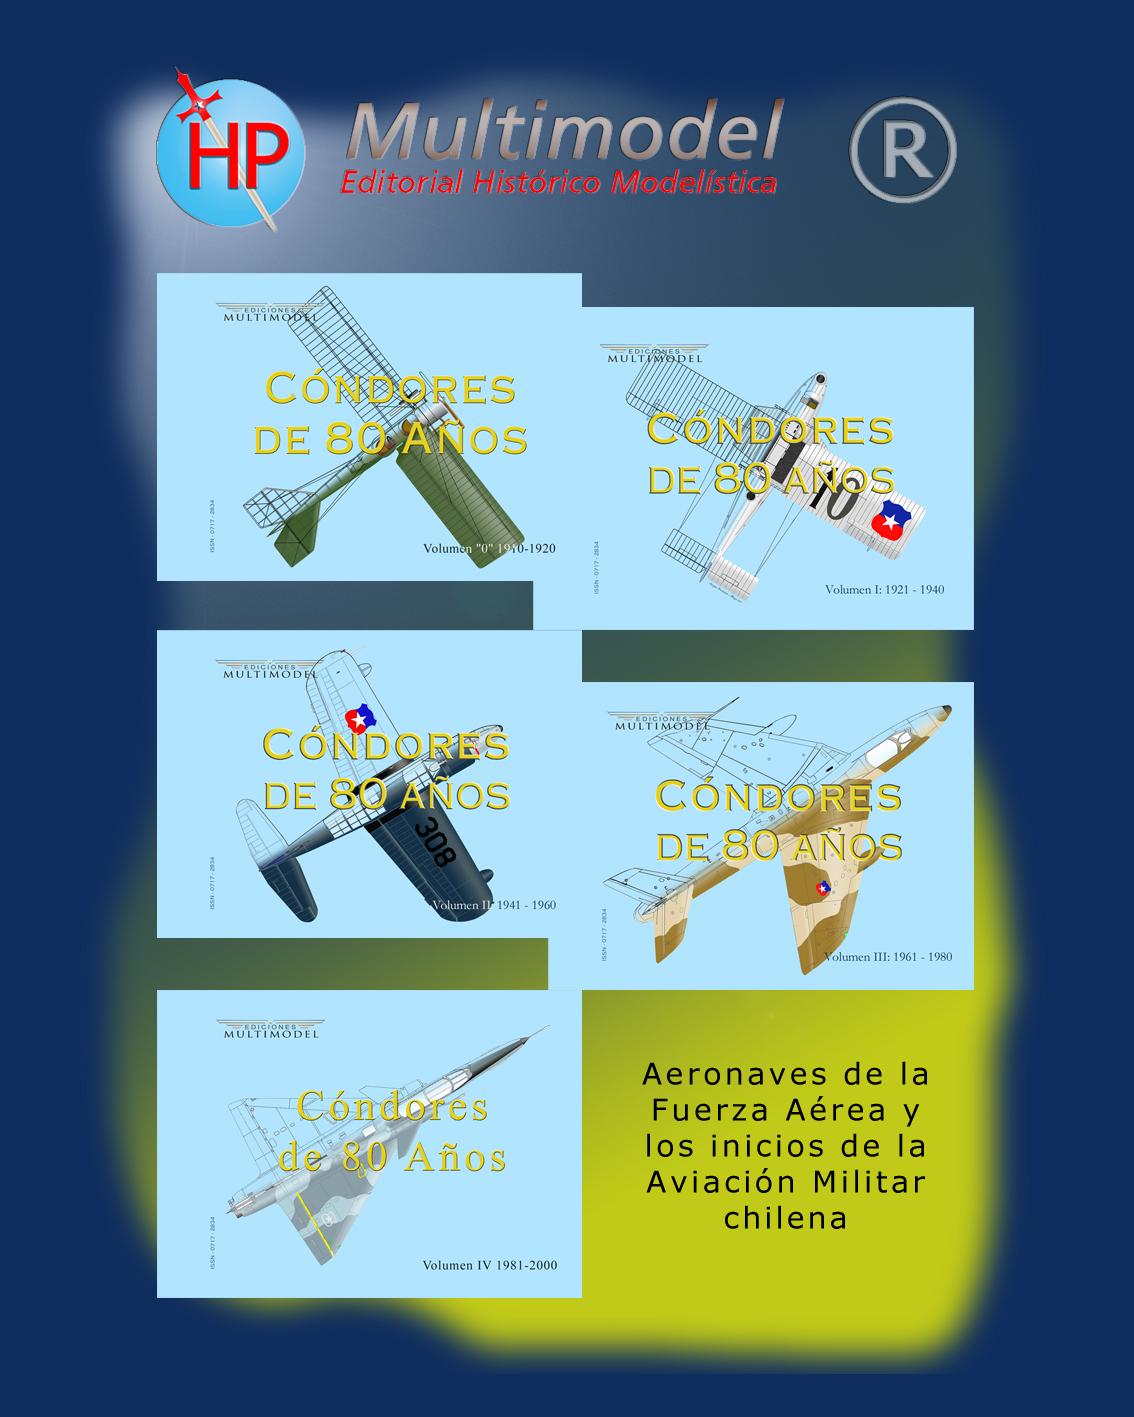 Historia Aeronáutica Militar